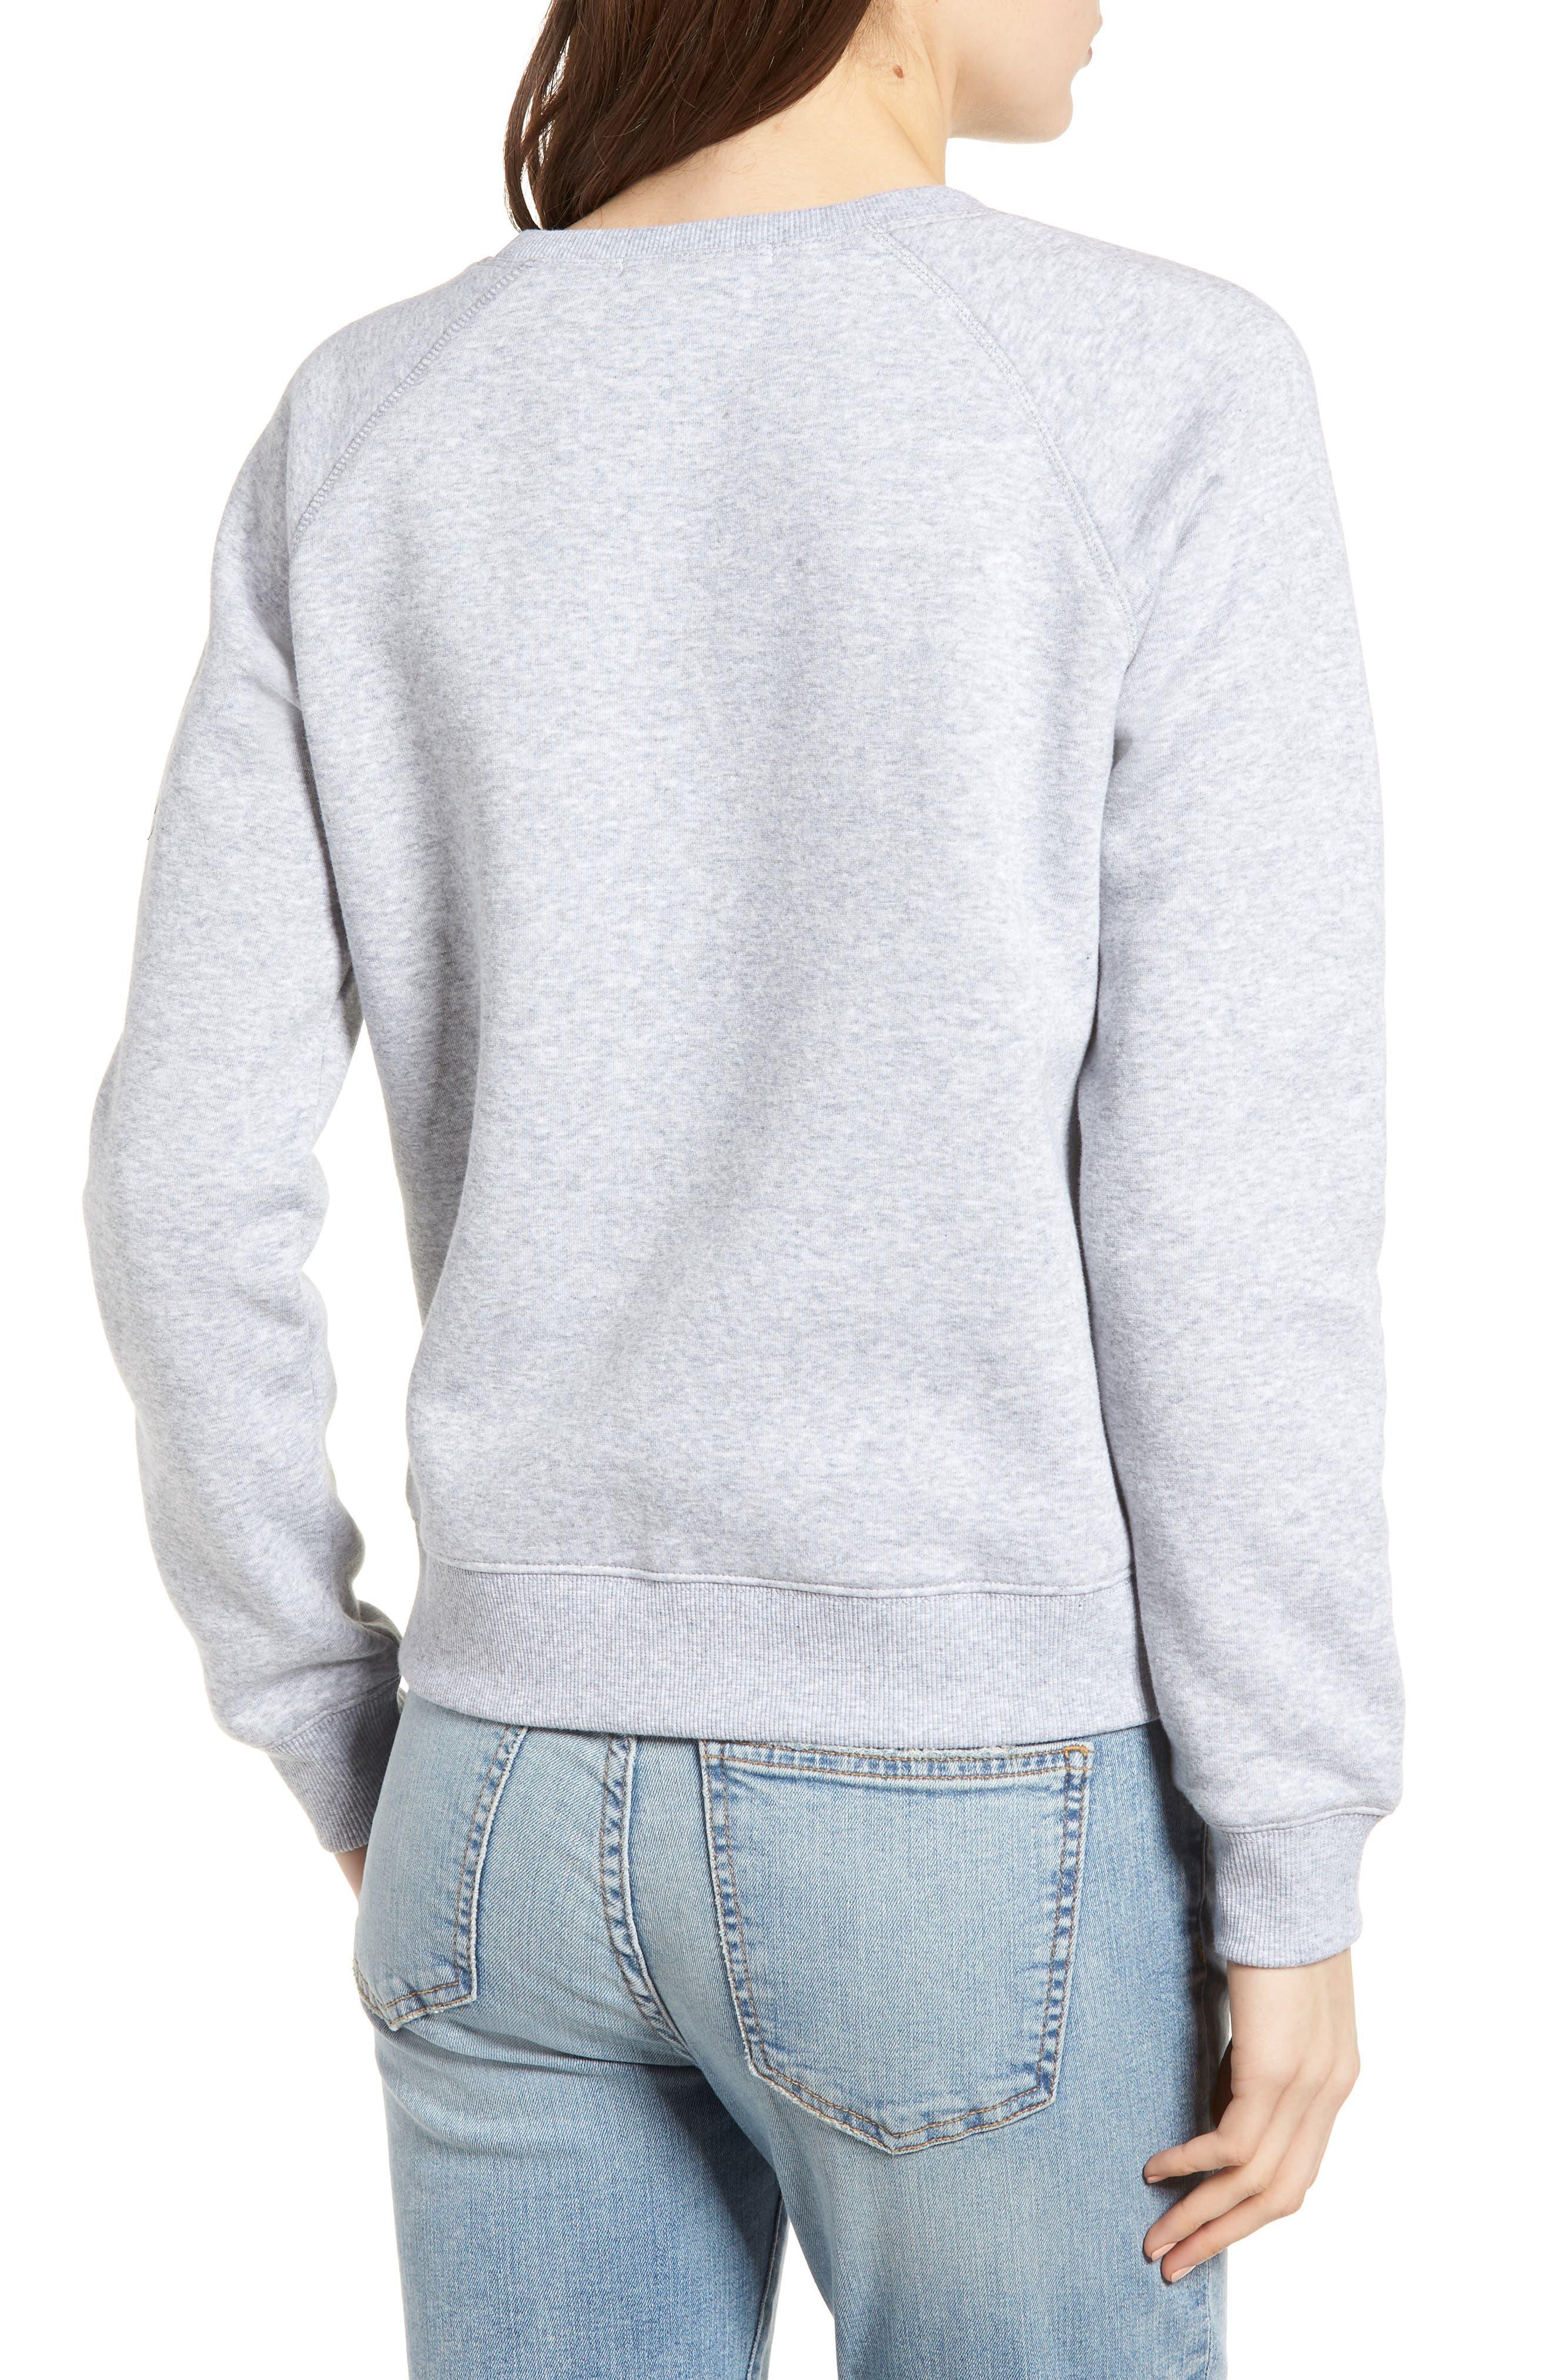 Lover Sweatshirt,                             Alternate thumbnail 2, color,                             038